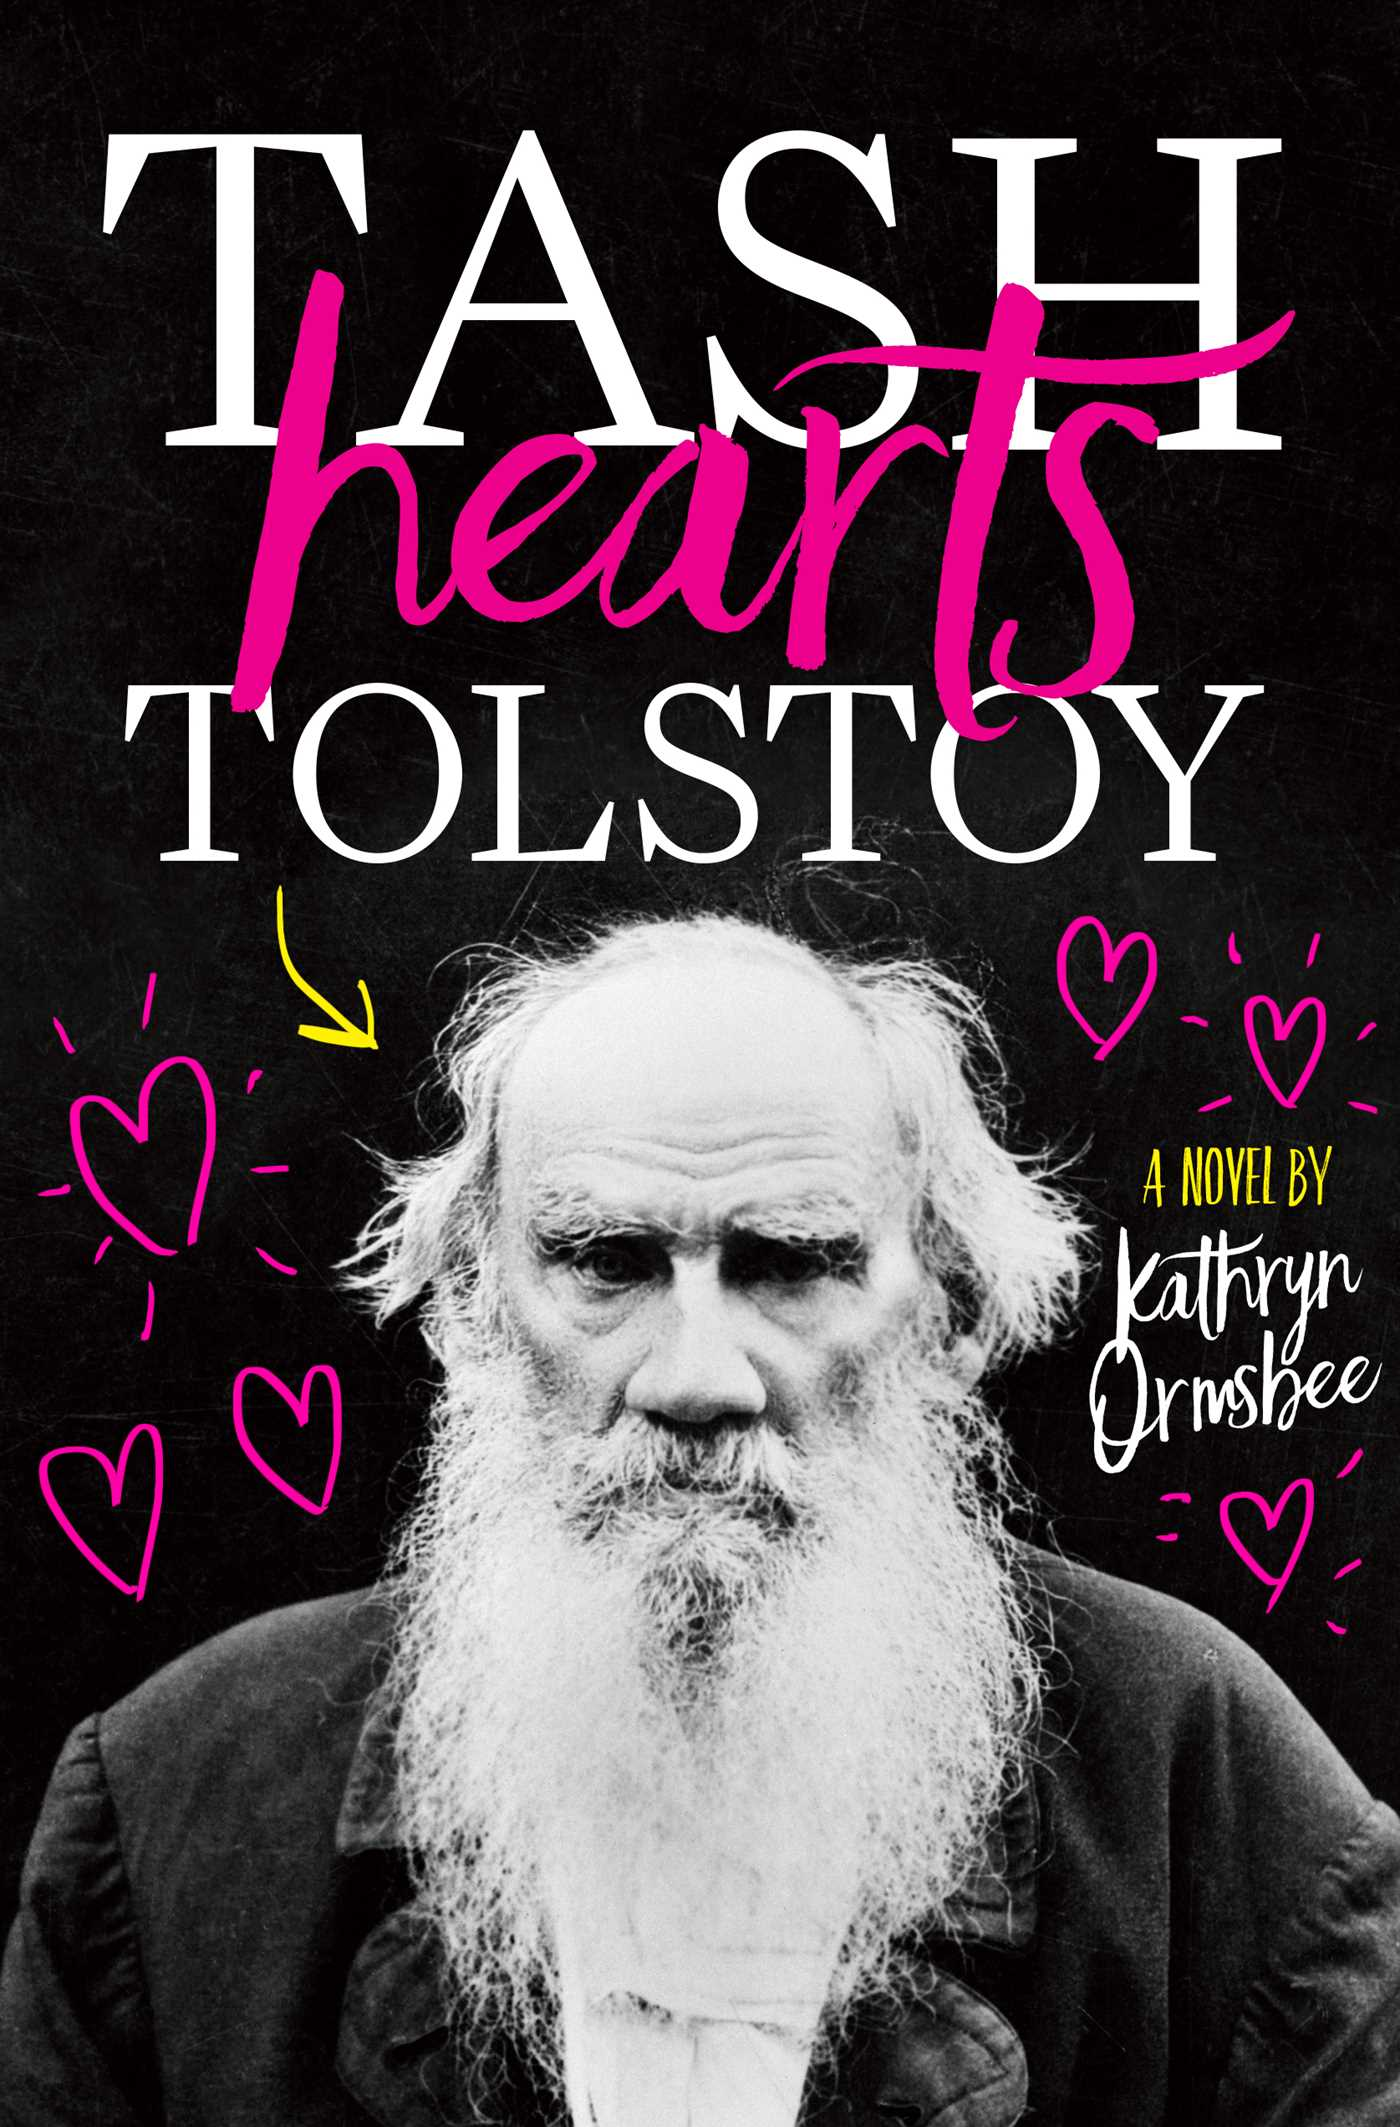 Tash hearts tolstoy 9781481489331 hr